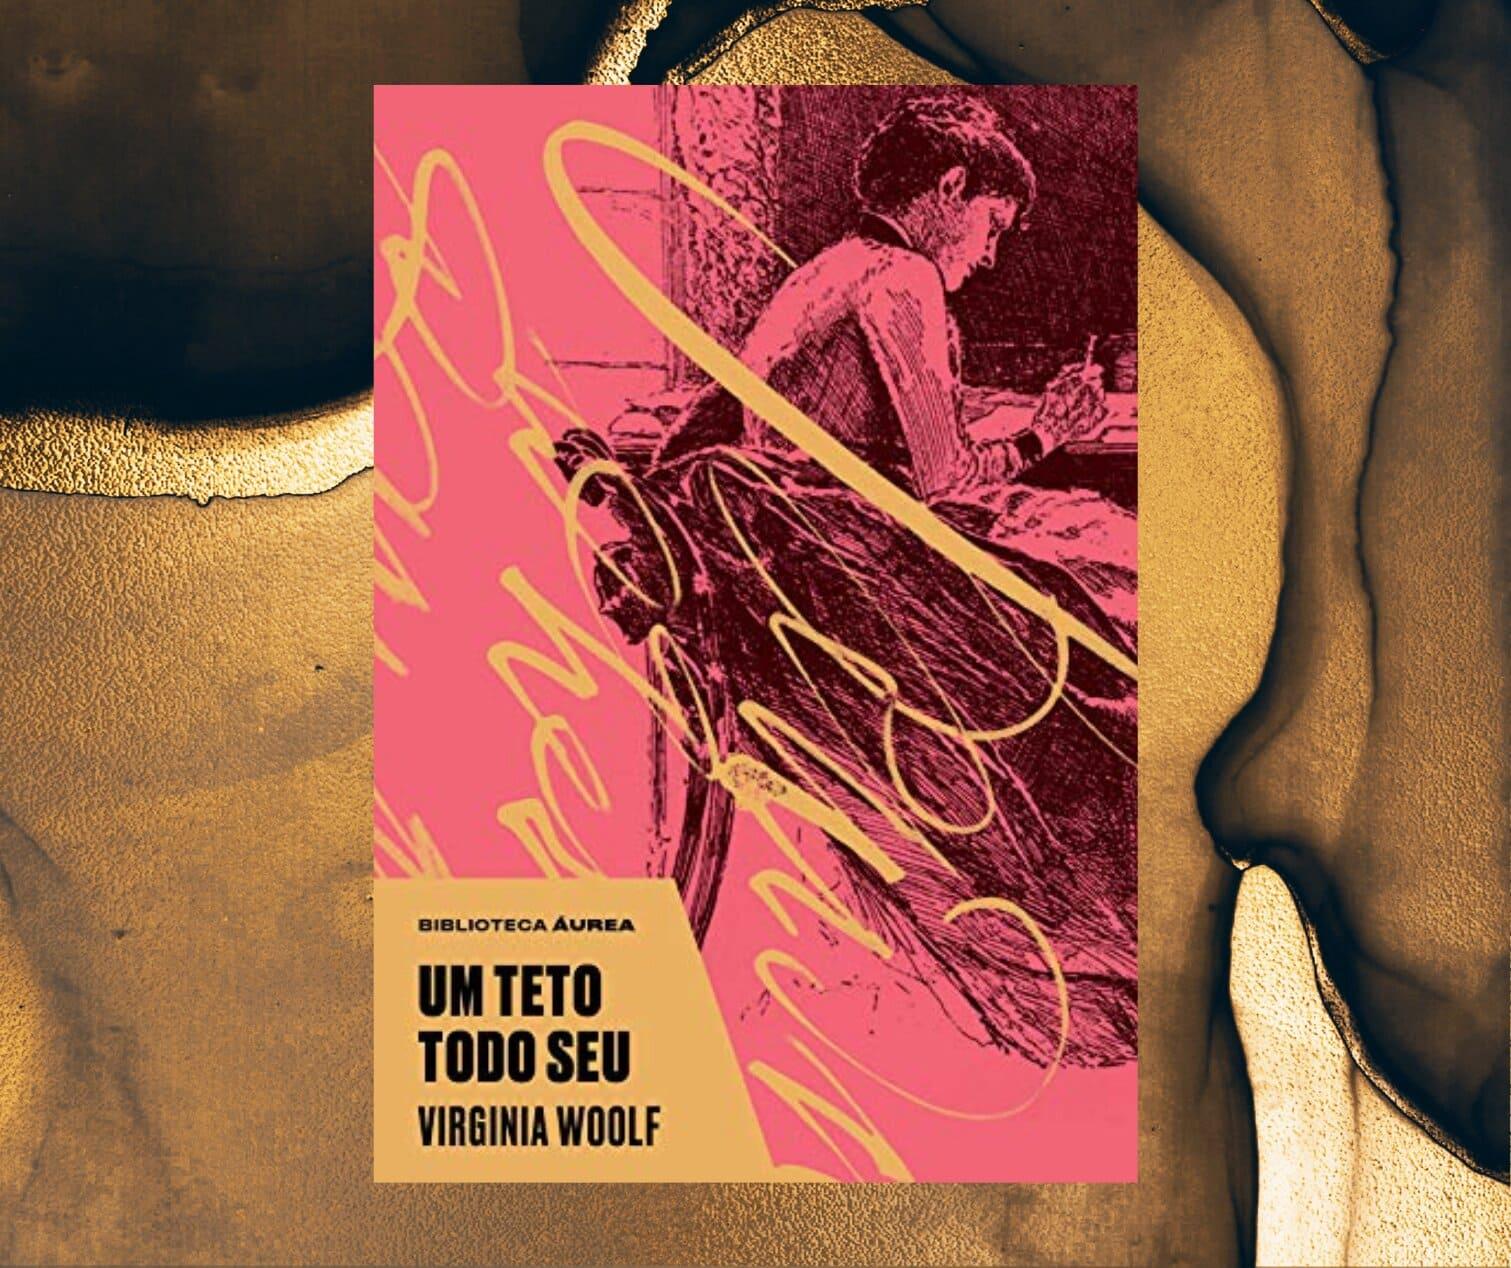 Resenha: Um teto todo seu, de Virginia Woolf